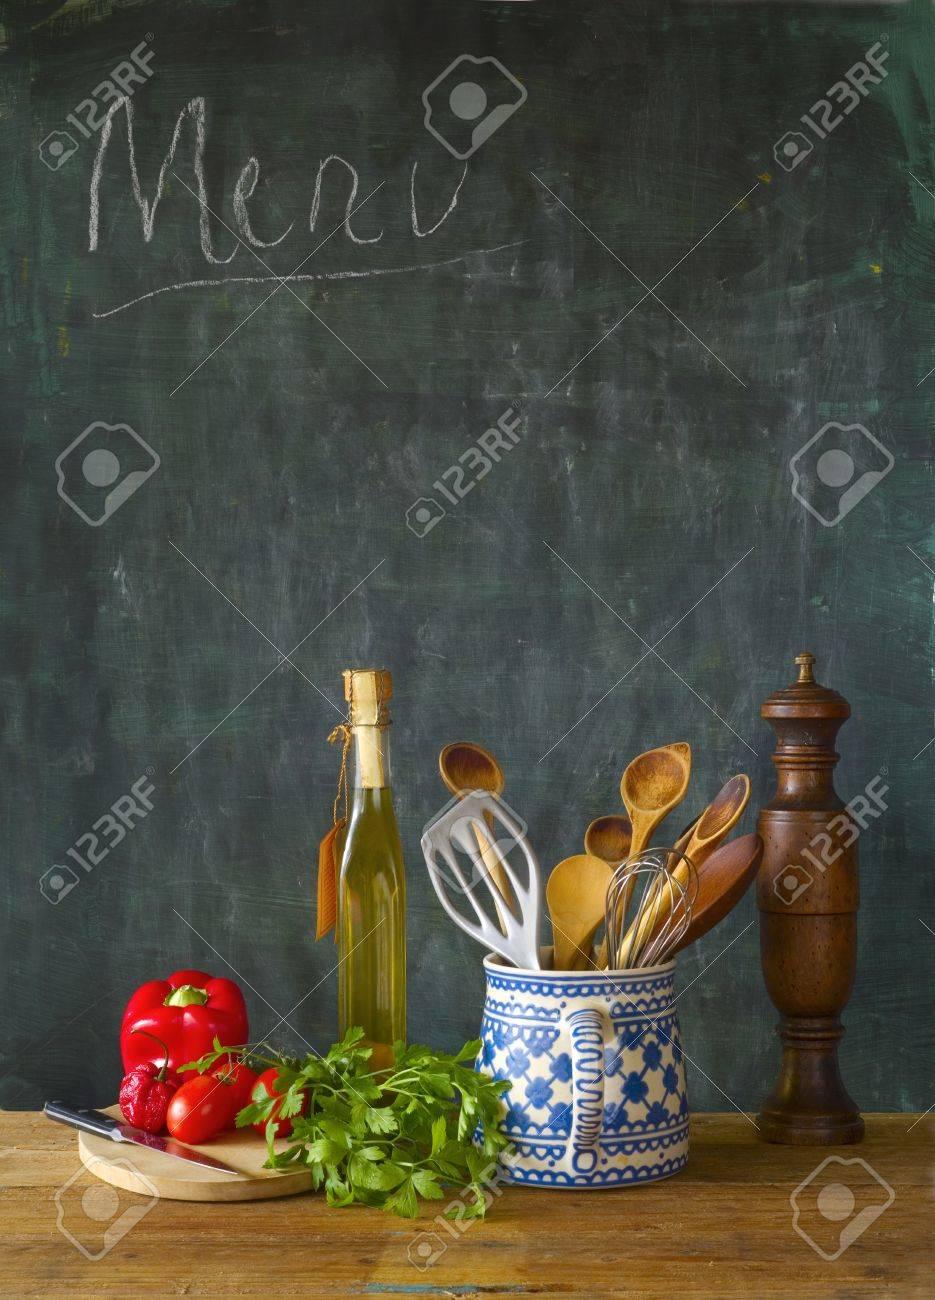 Food ingredients,kitchen utensils, black board, free copy space - 34317683